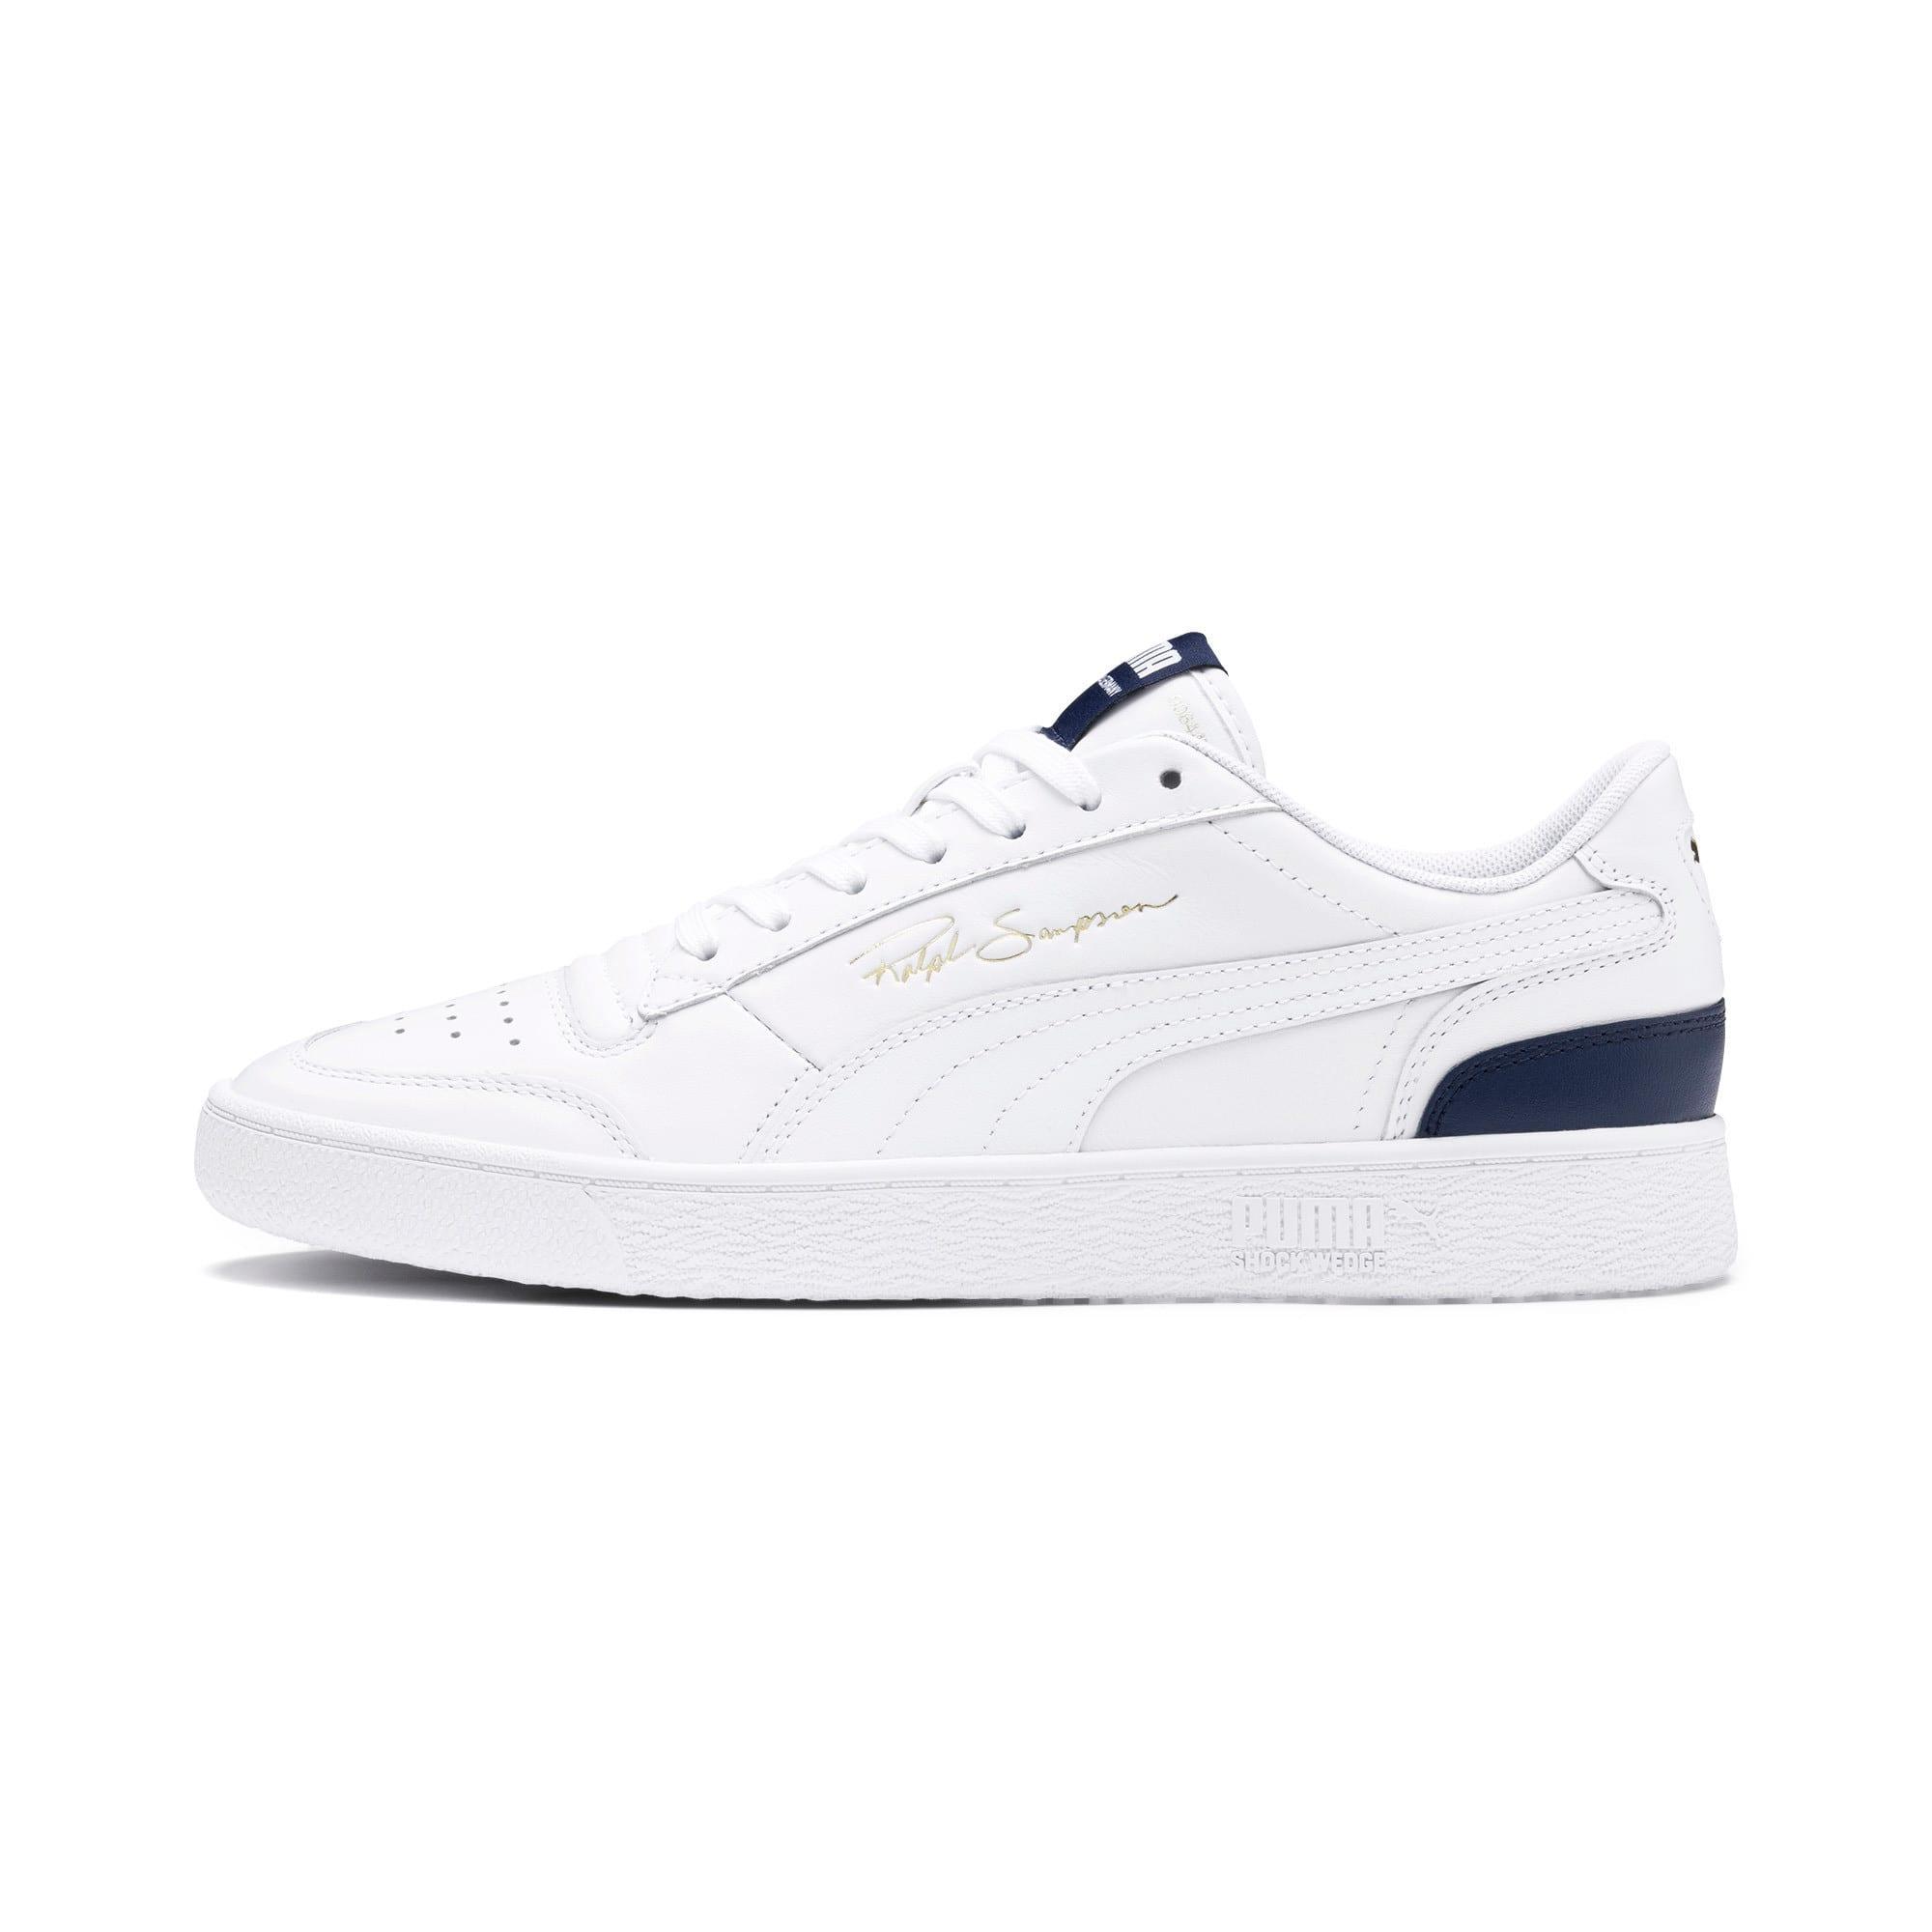 Thumbnail 1 of Ralph Sampson Lo Sneakers, Puma Wht-Peacoat-Puma Wht, medium